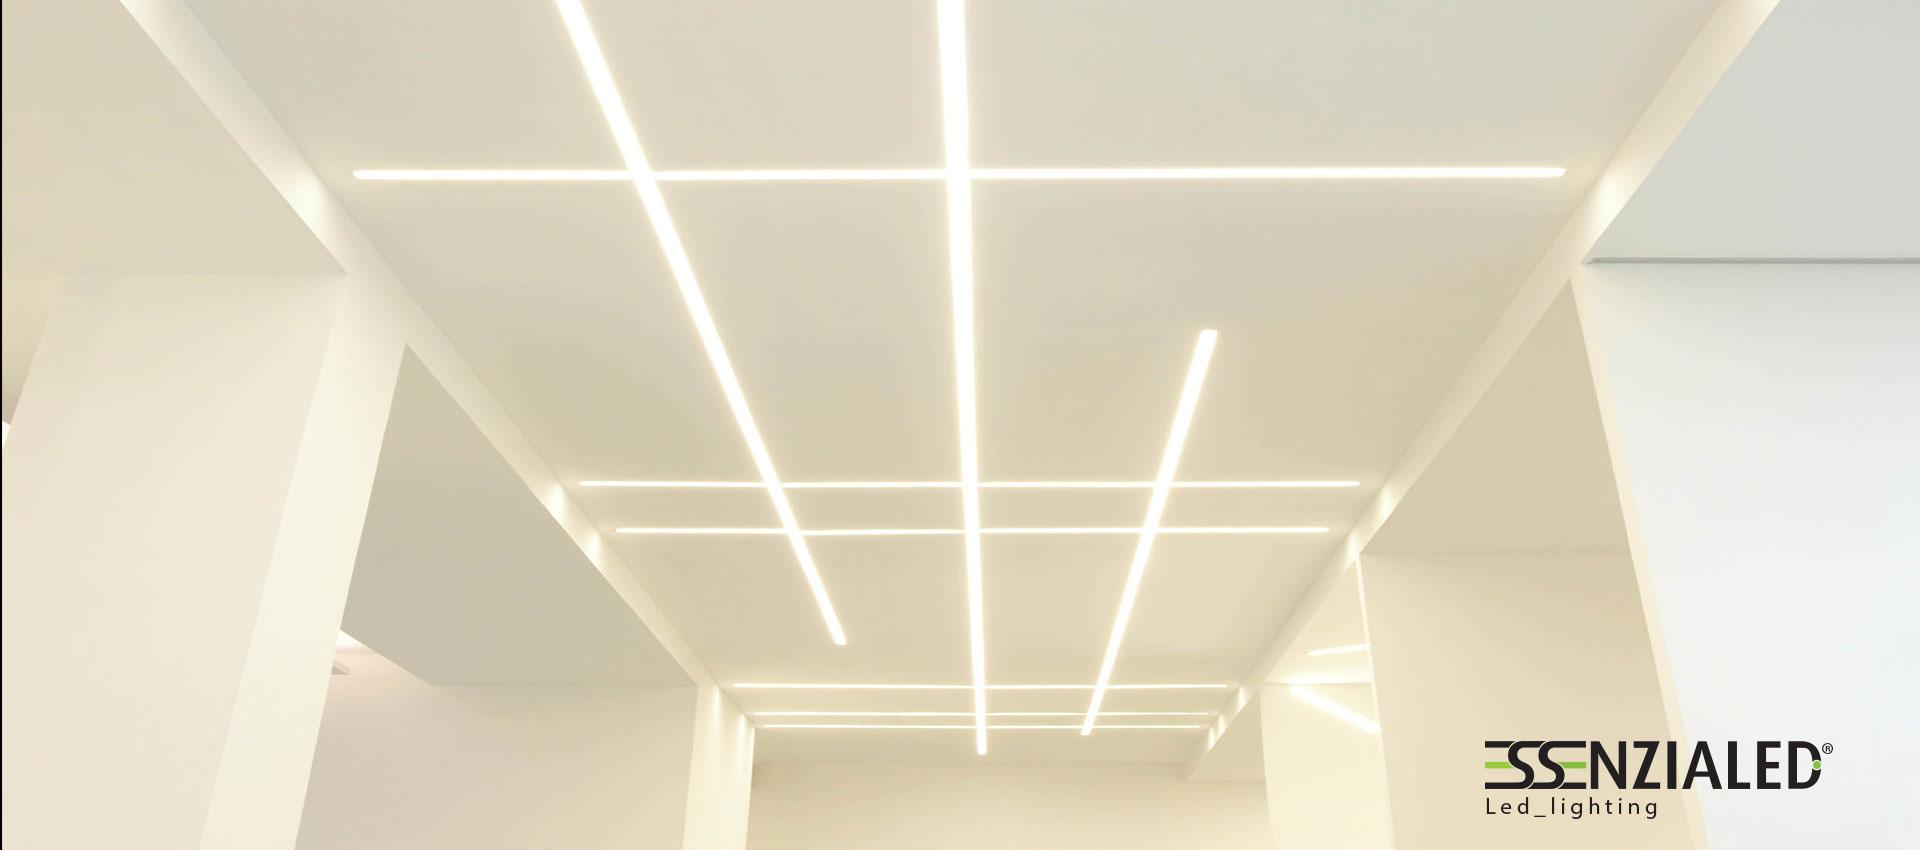 Ghost lampada lineare trimlessessenzialed for Lampada alogena lineare led